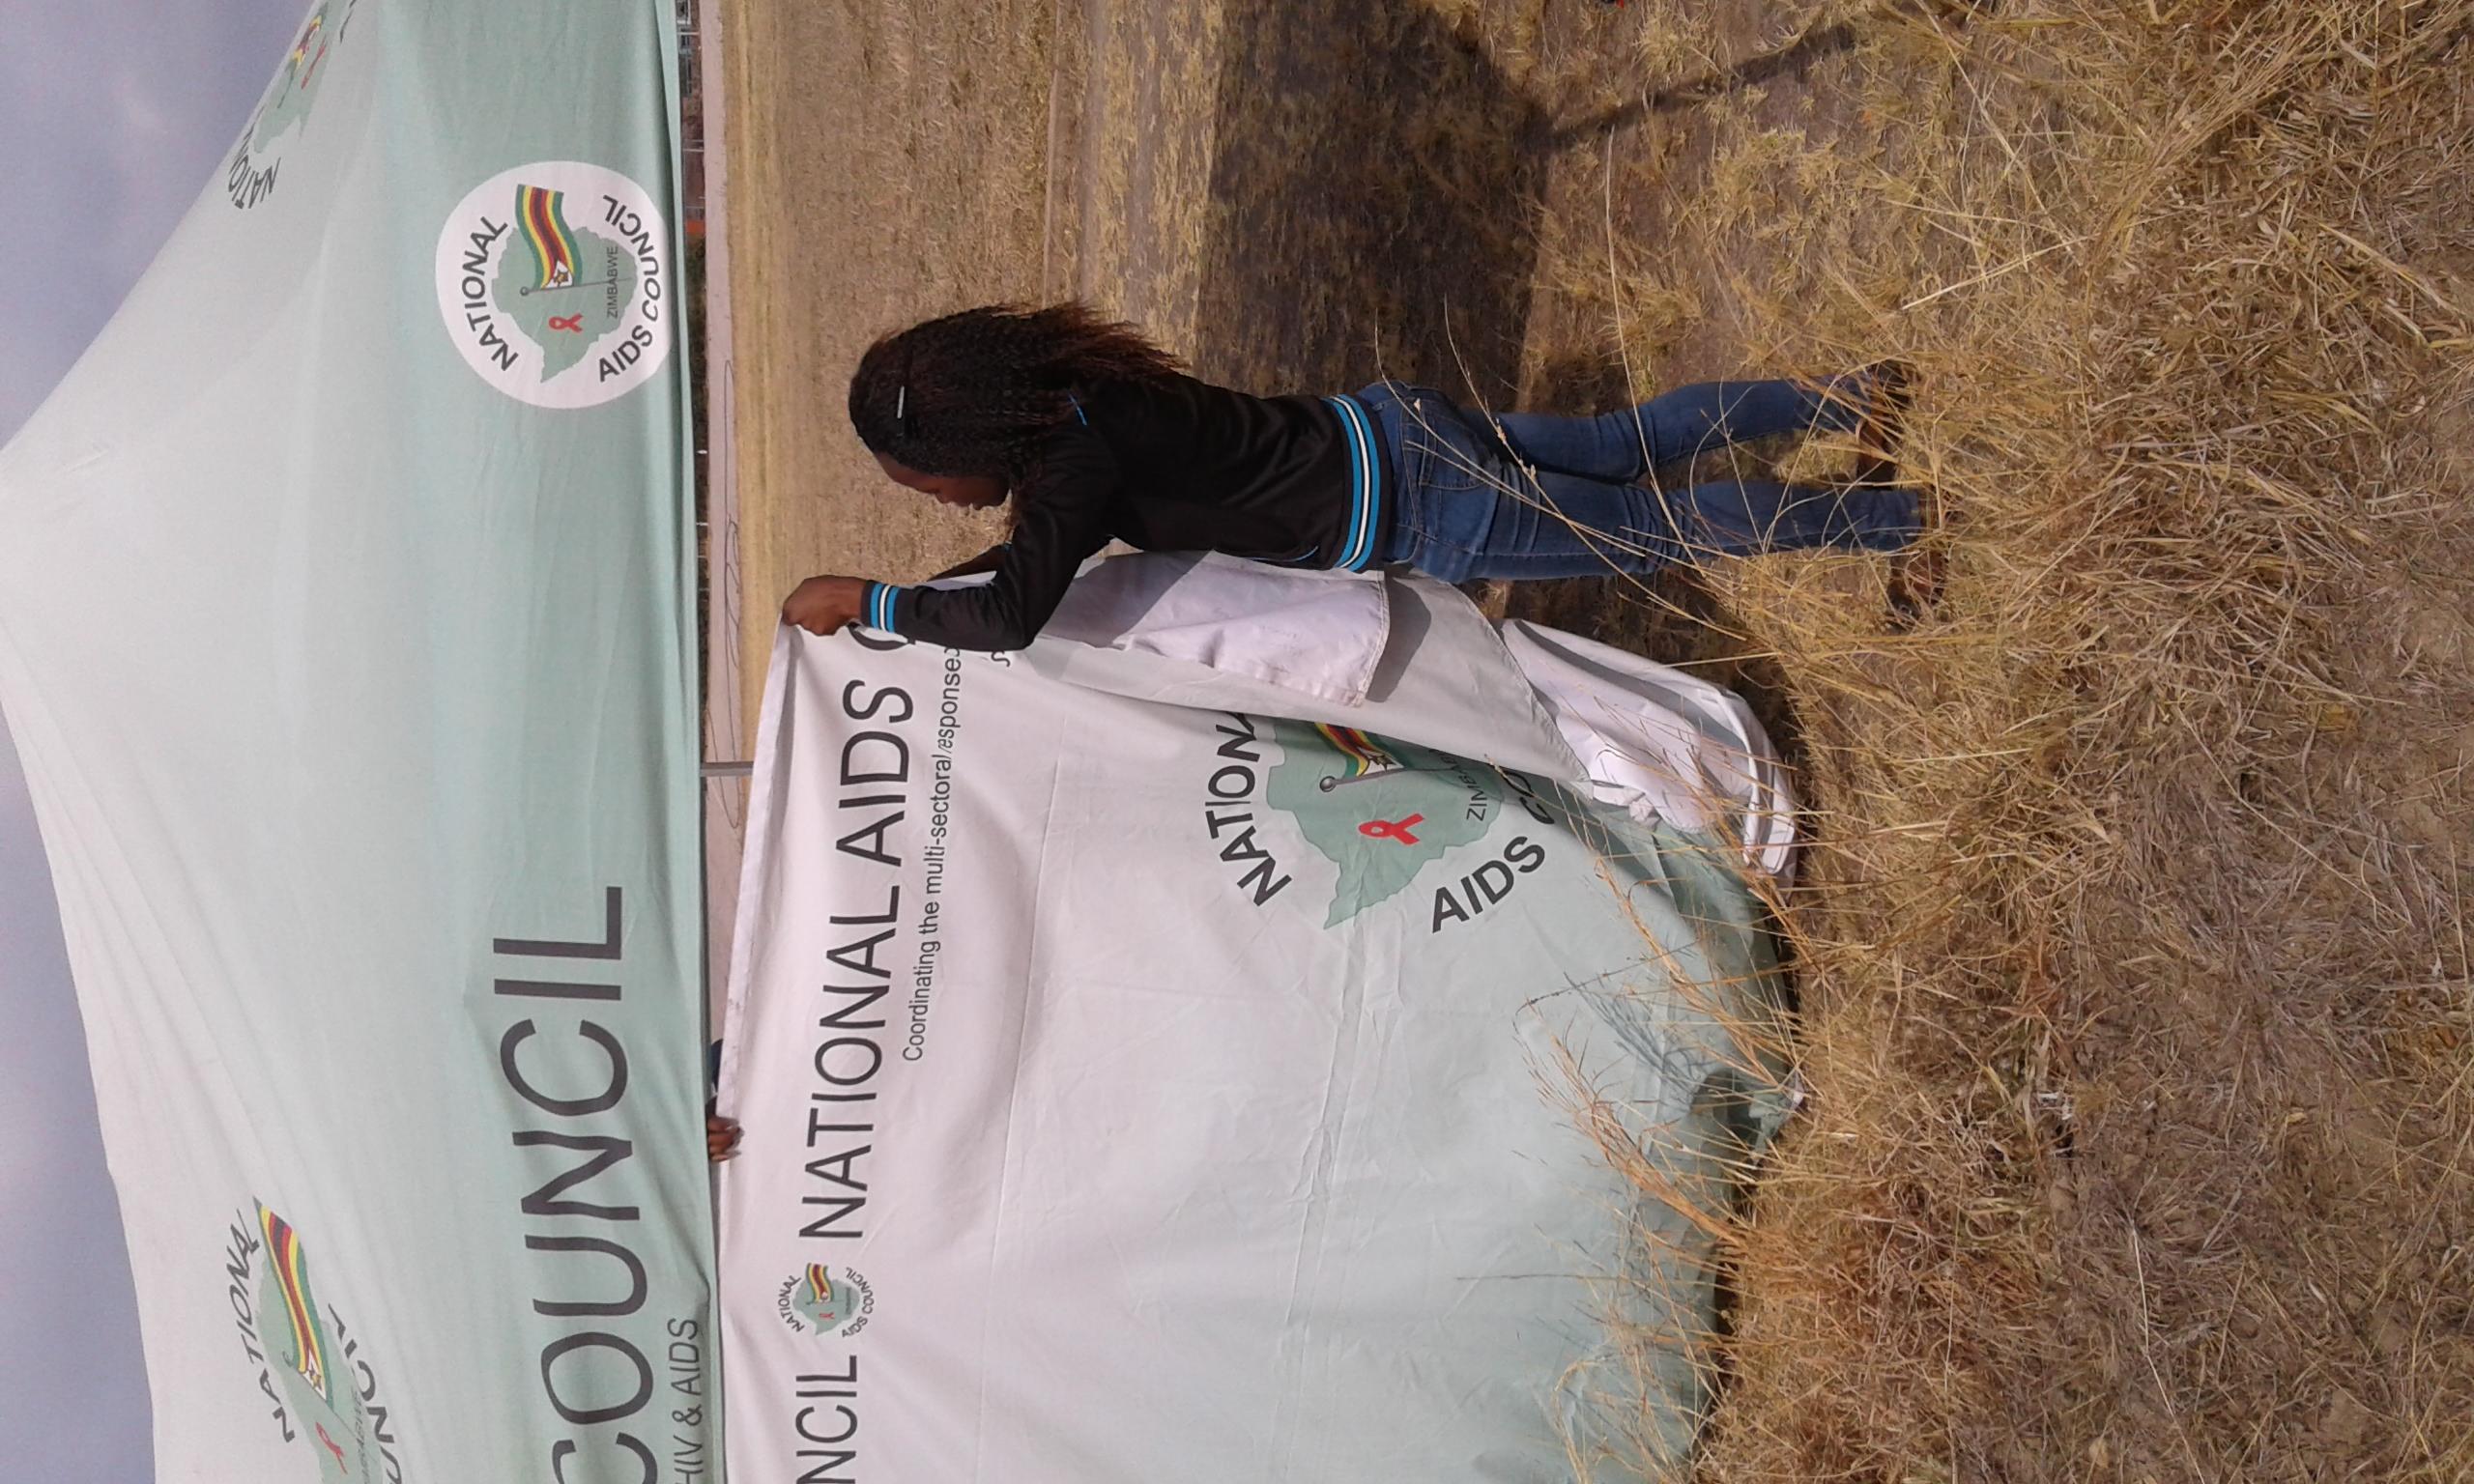 File:GREAT ZIMBABWE UNIVERSITY PEER EDUCATORS, ZIMBABWE 09